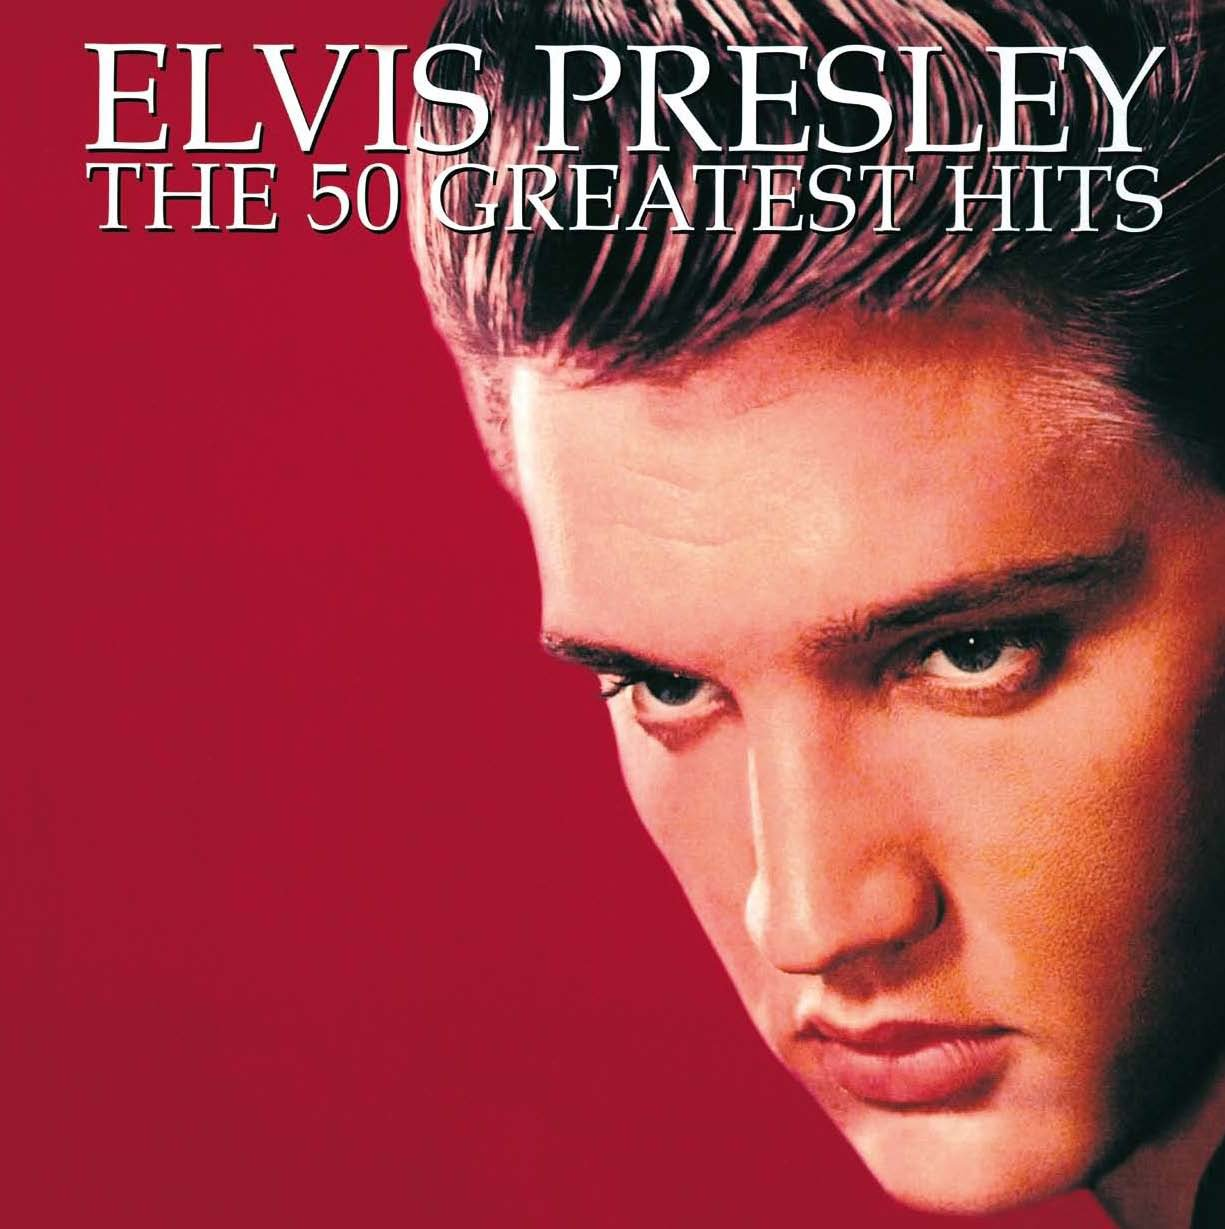 Elvis Presley - The 50 Greatest Hits by Music On Vinyl